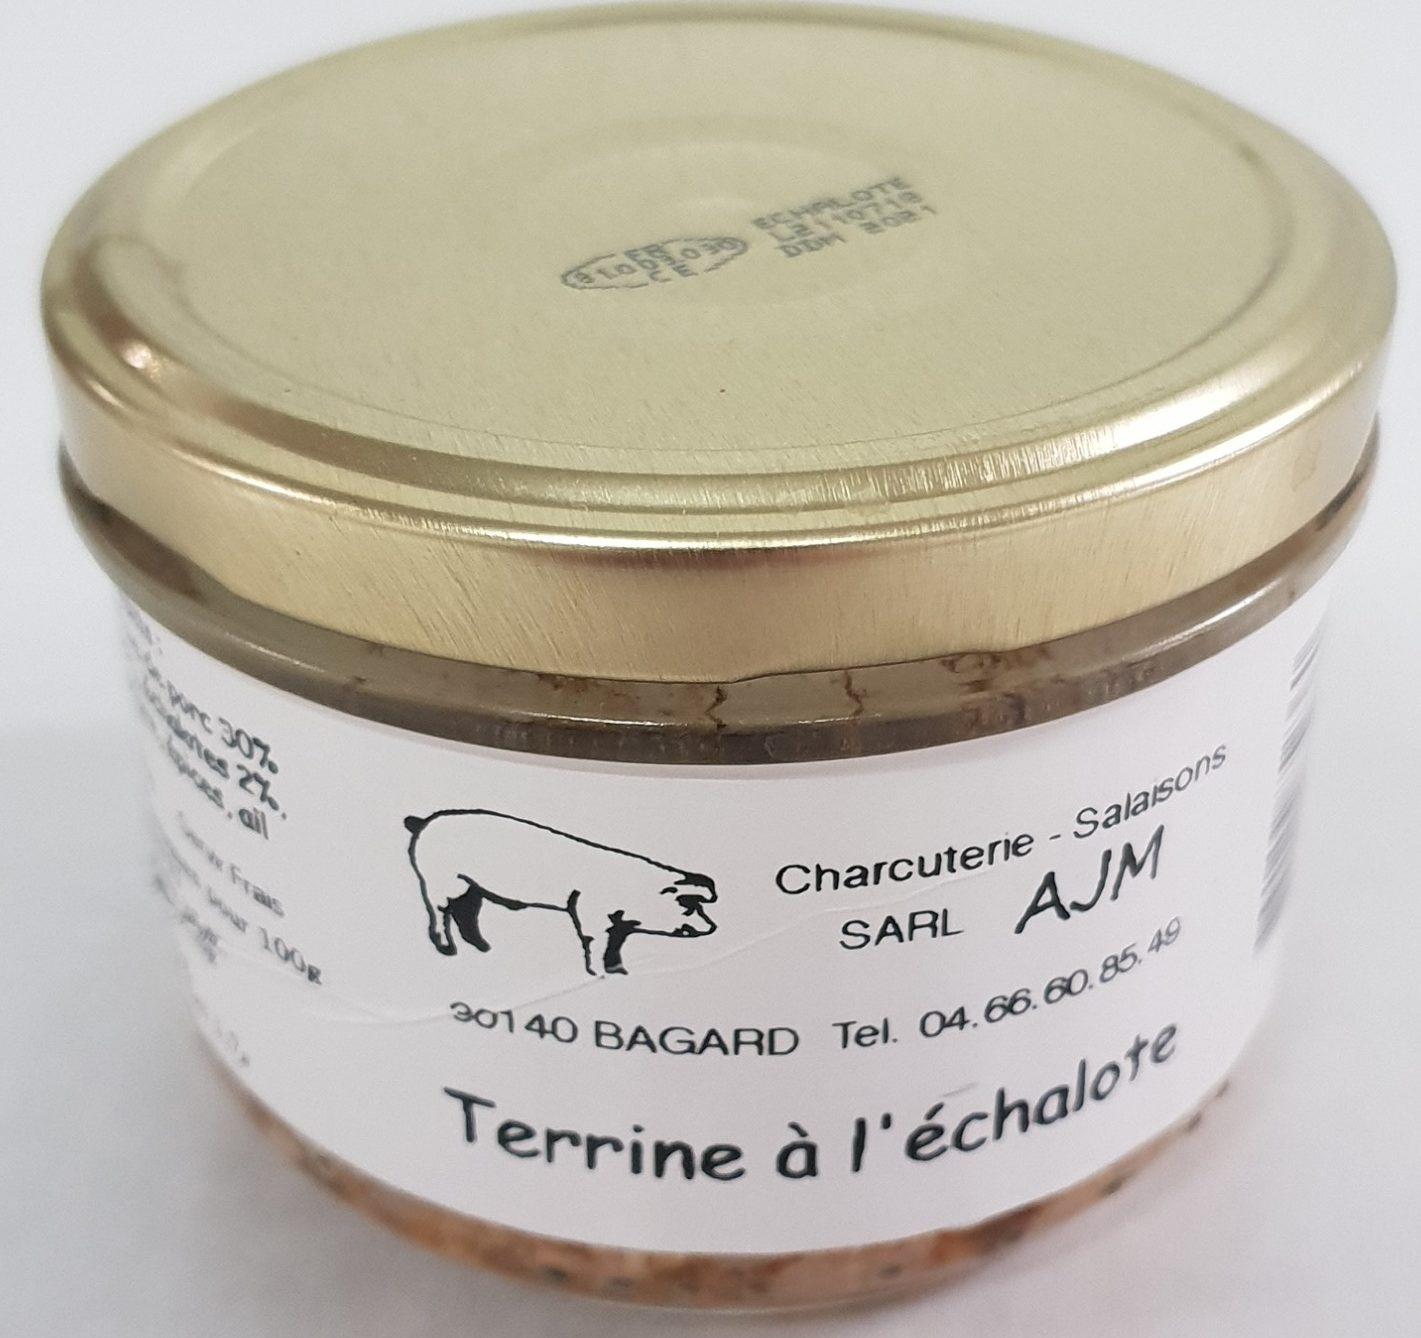 TERRINE A L'ECHALOTE - Product